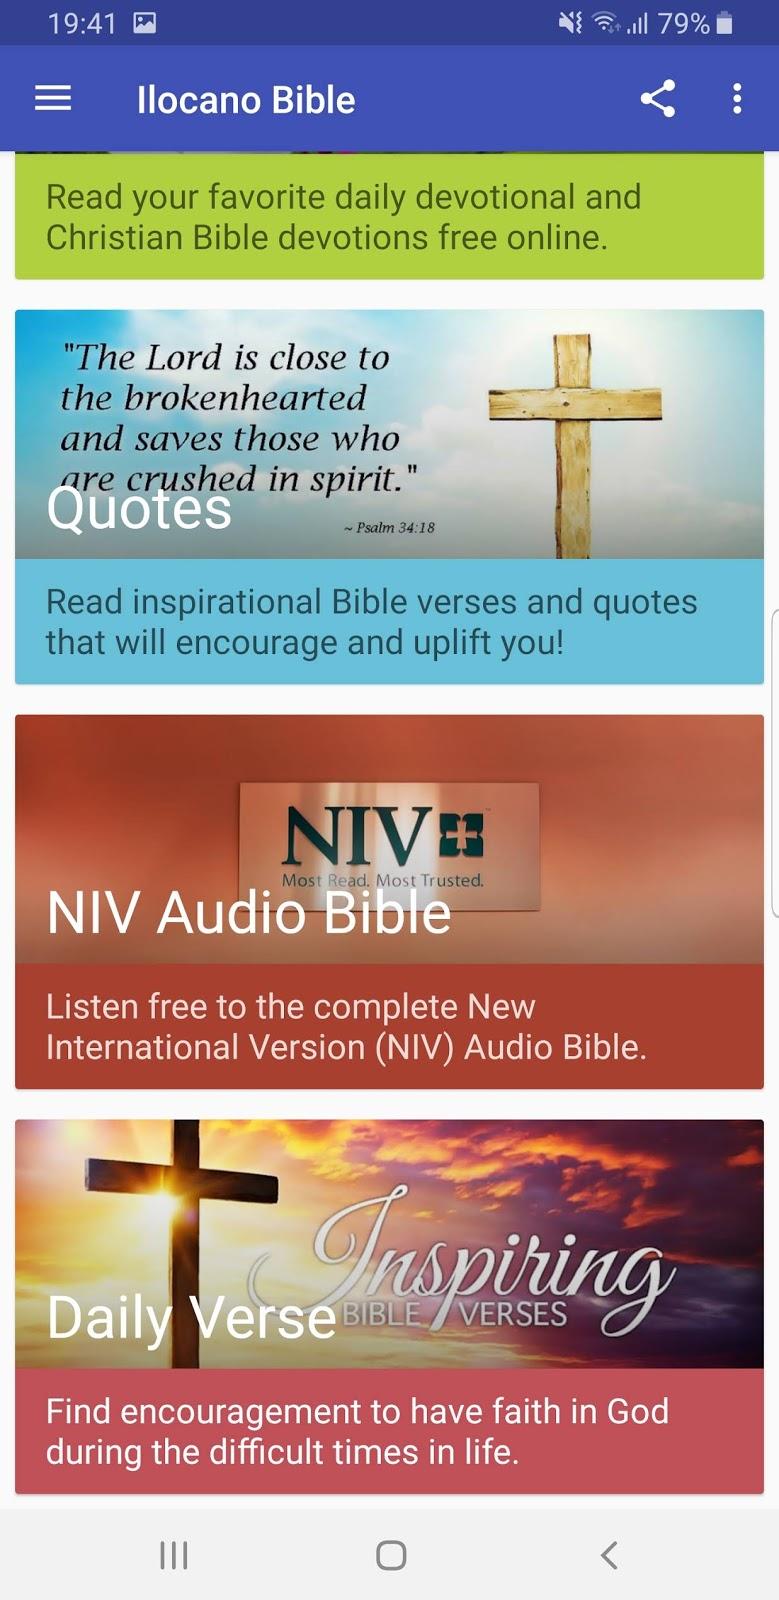 Ilocano (Philippines) Bible App